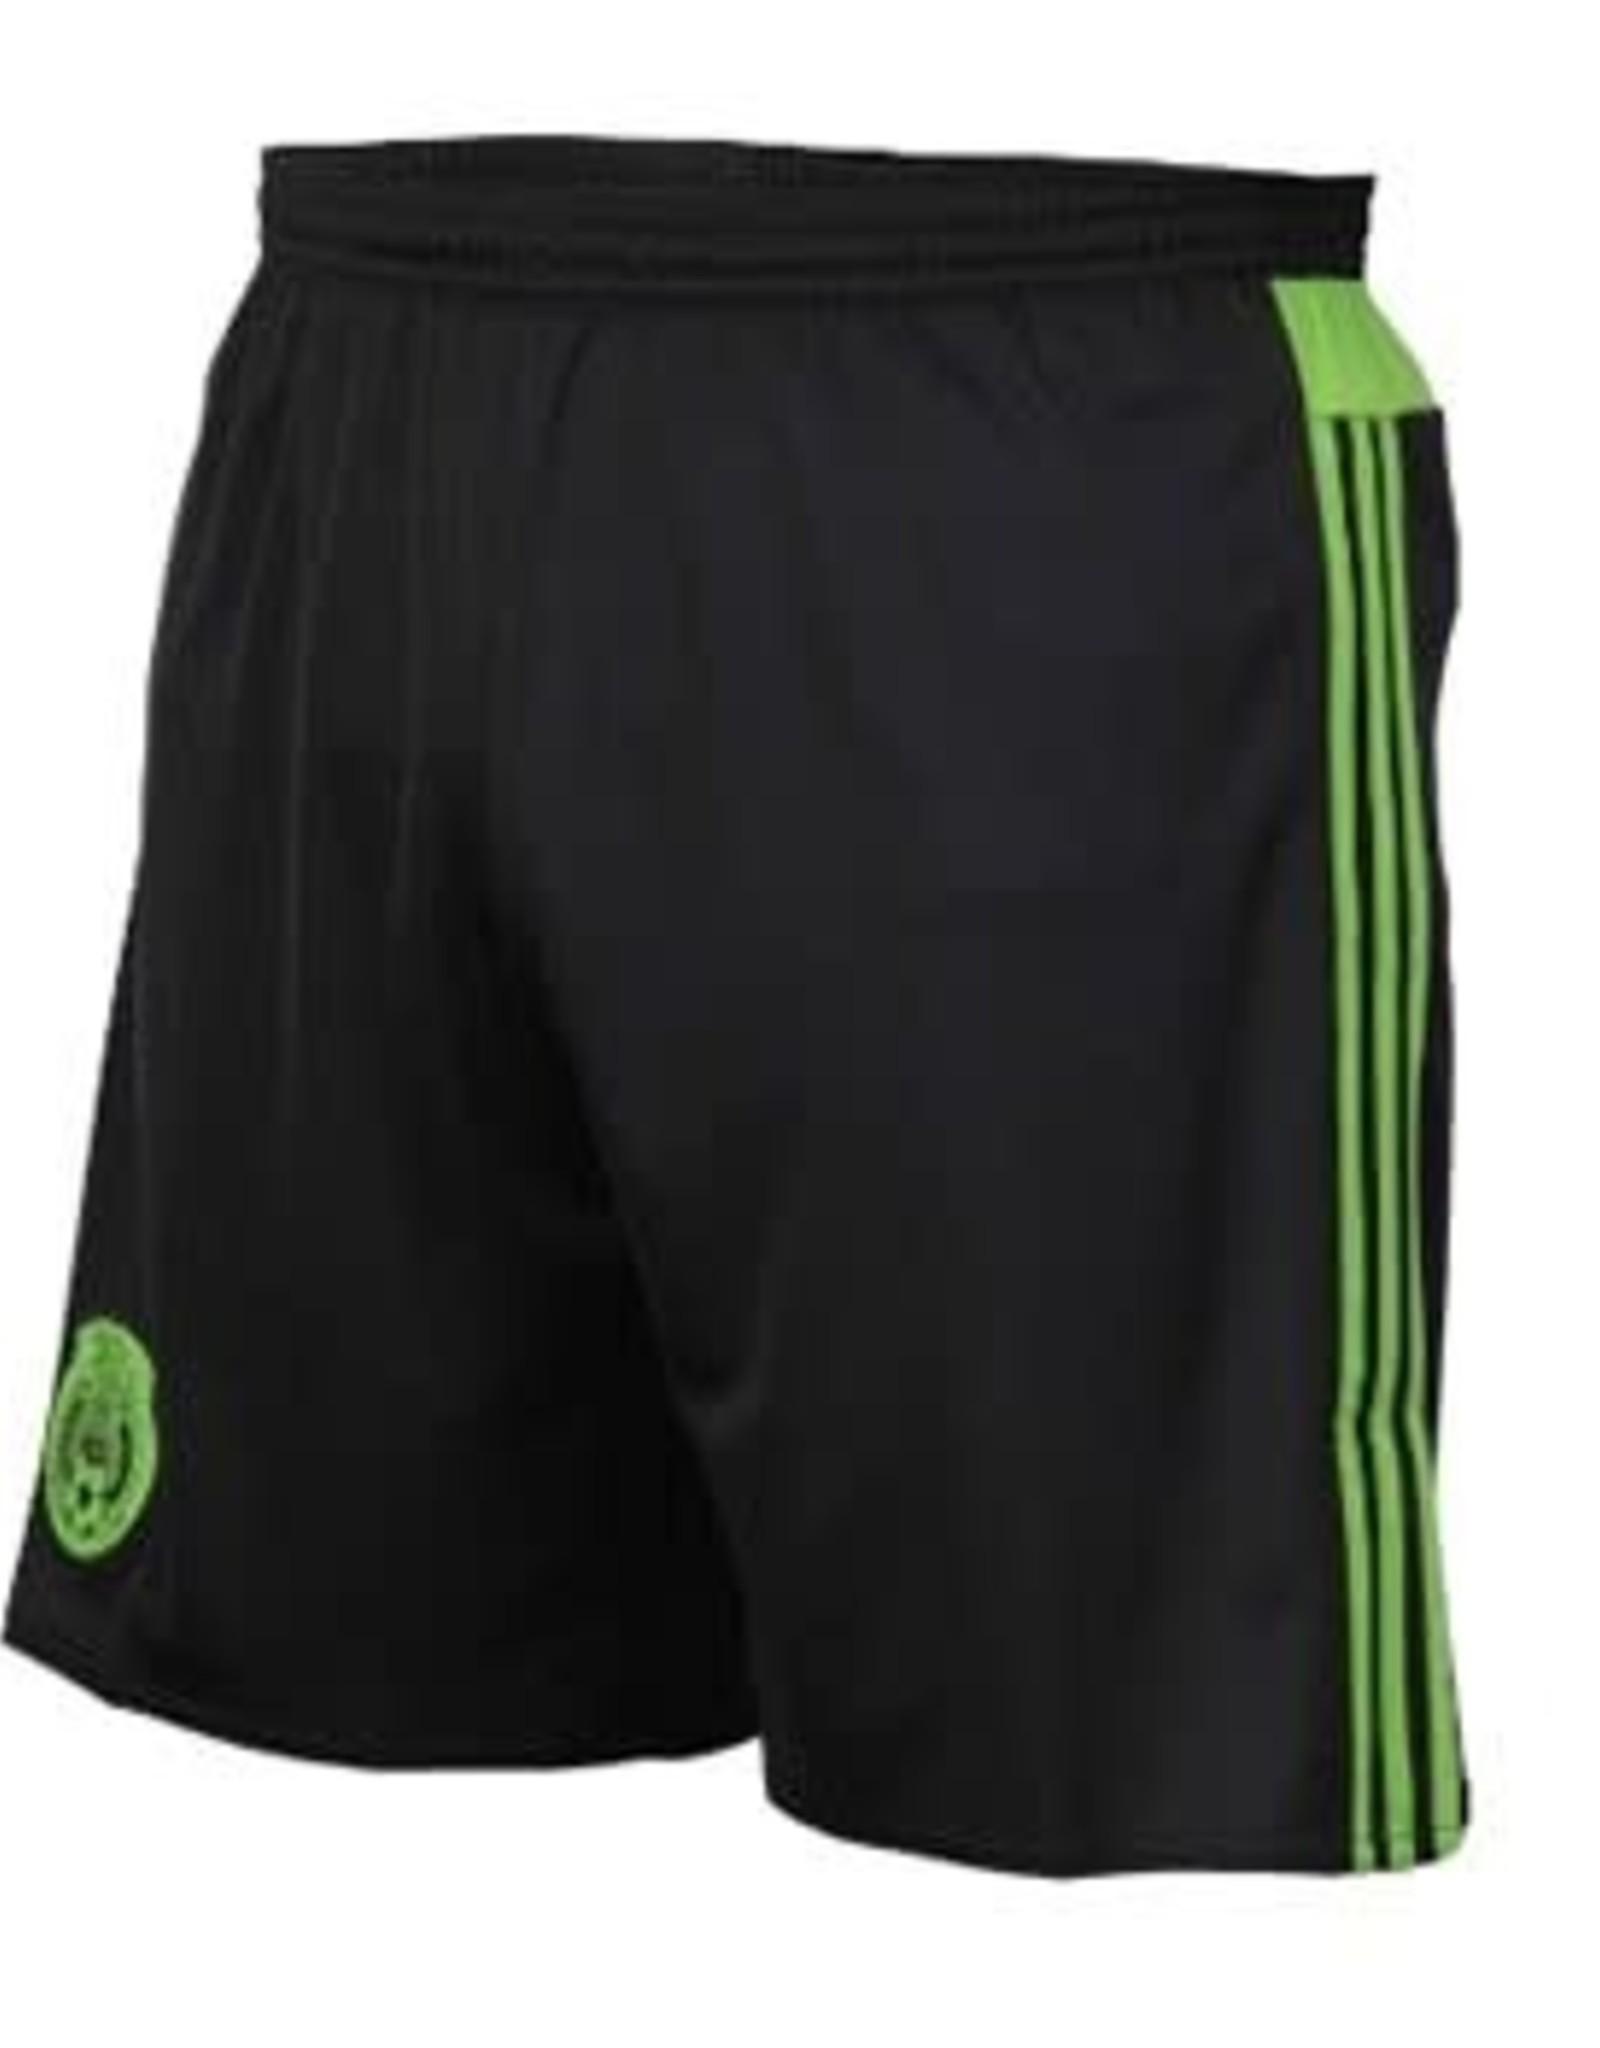 Adidas Mexico Home Shorts